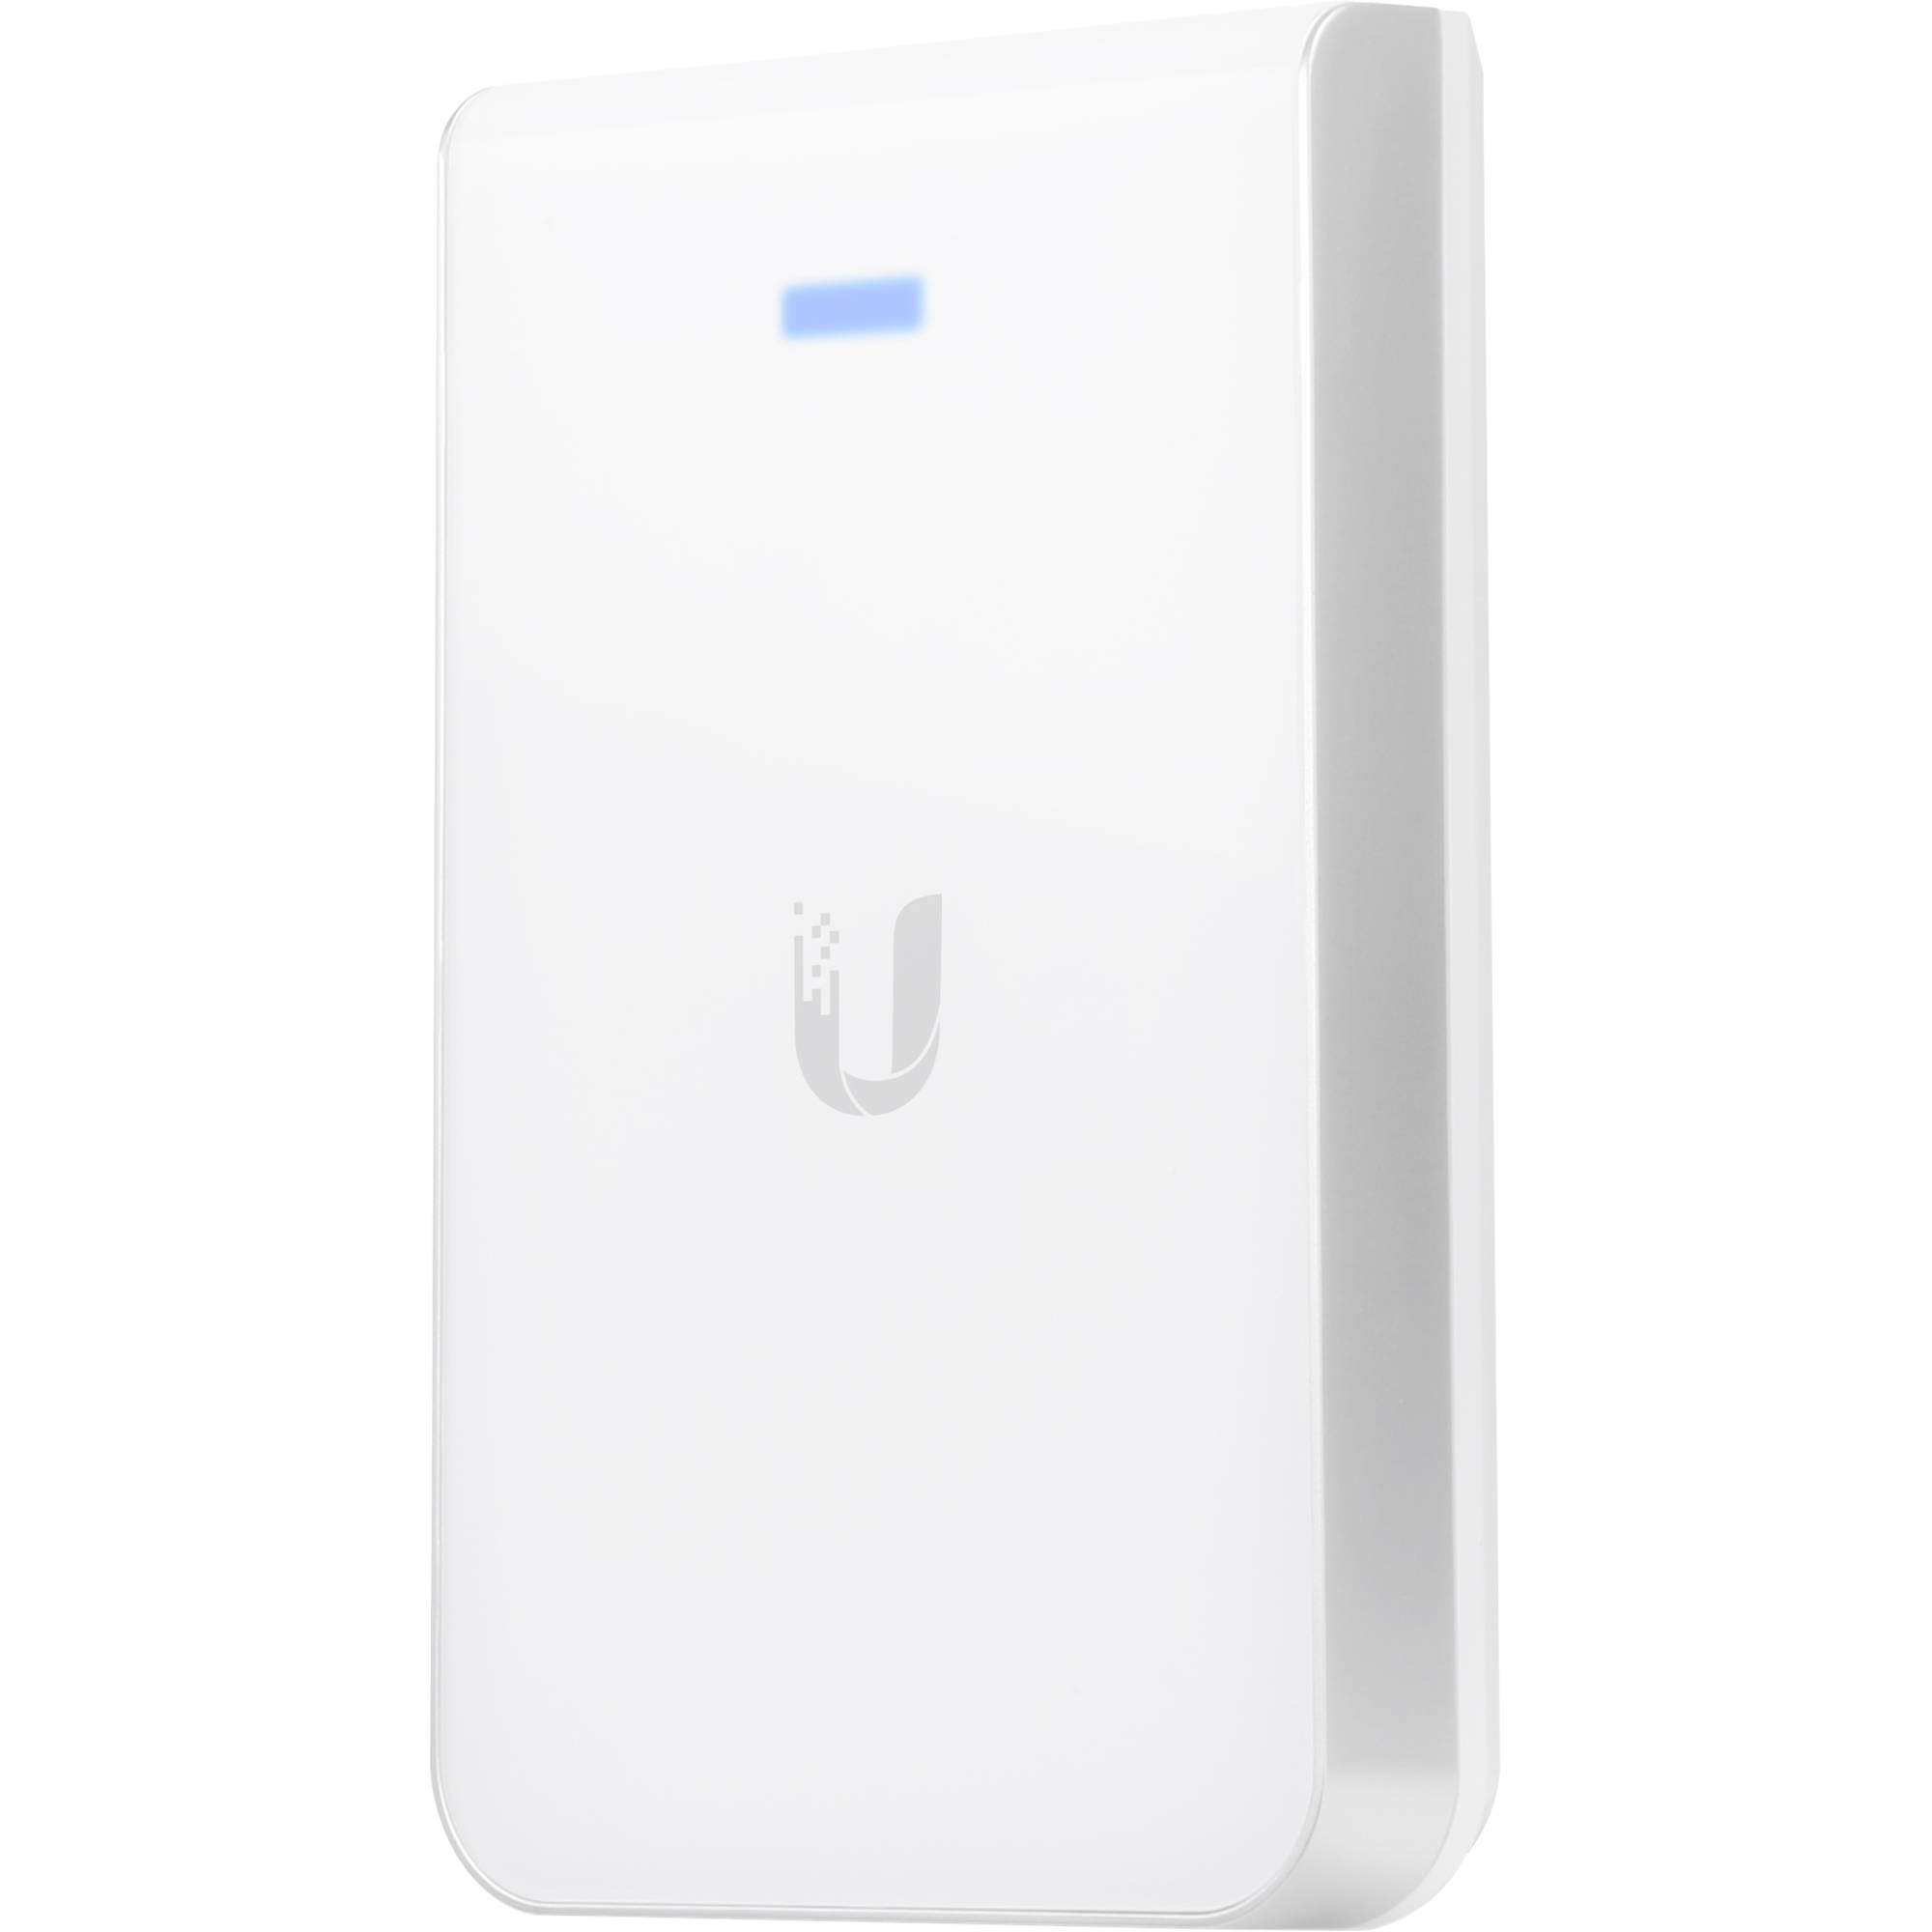 Unifi Controller Download Windows 10